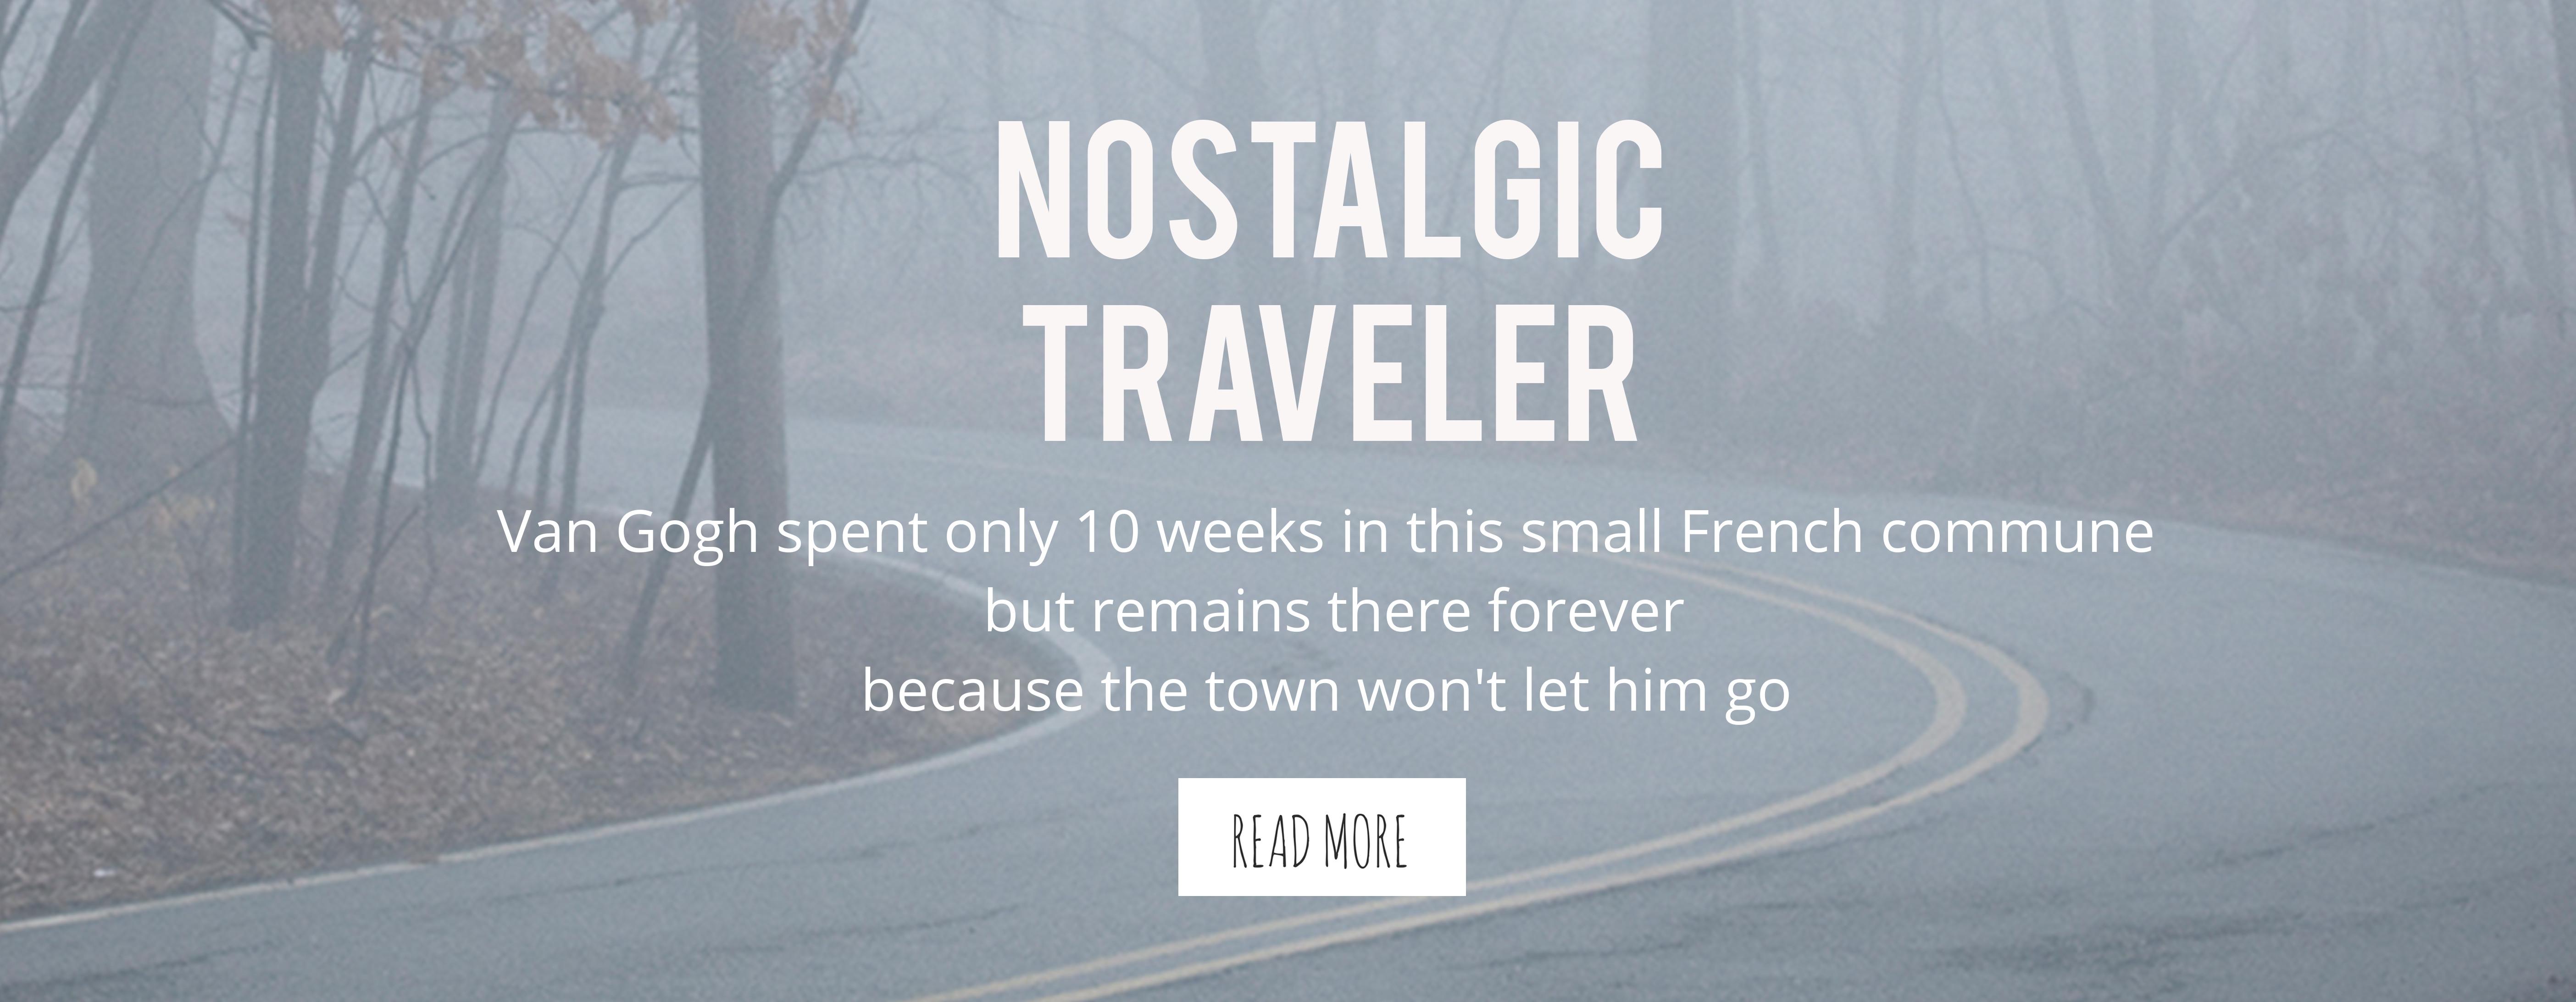 nostalgic-traveler-readmore-2